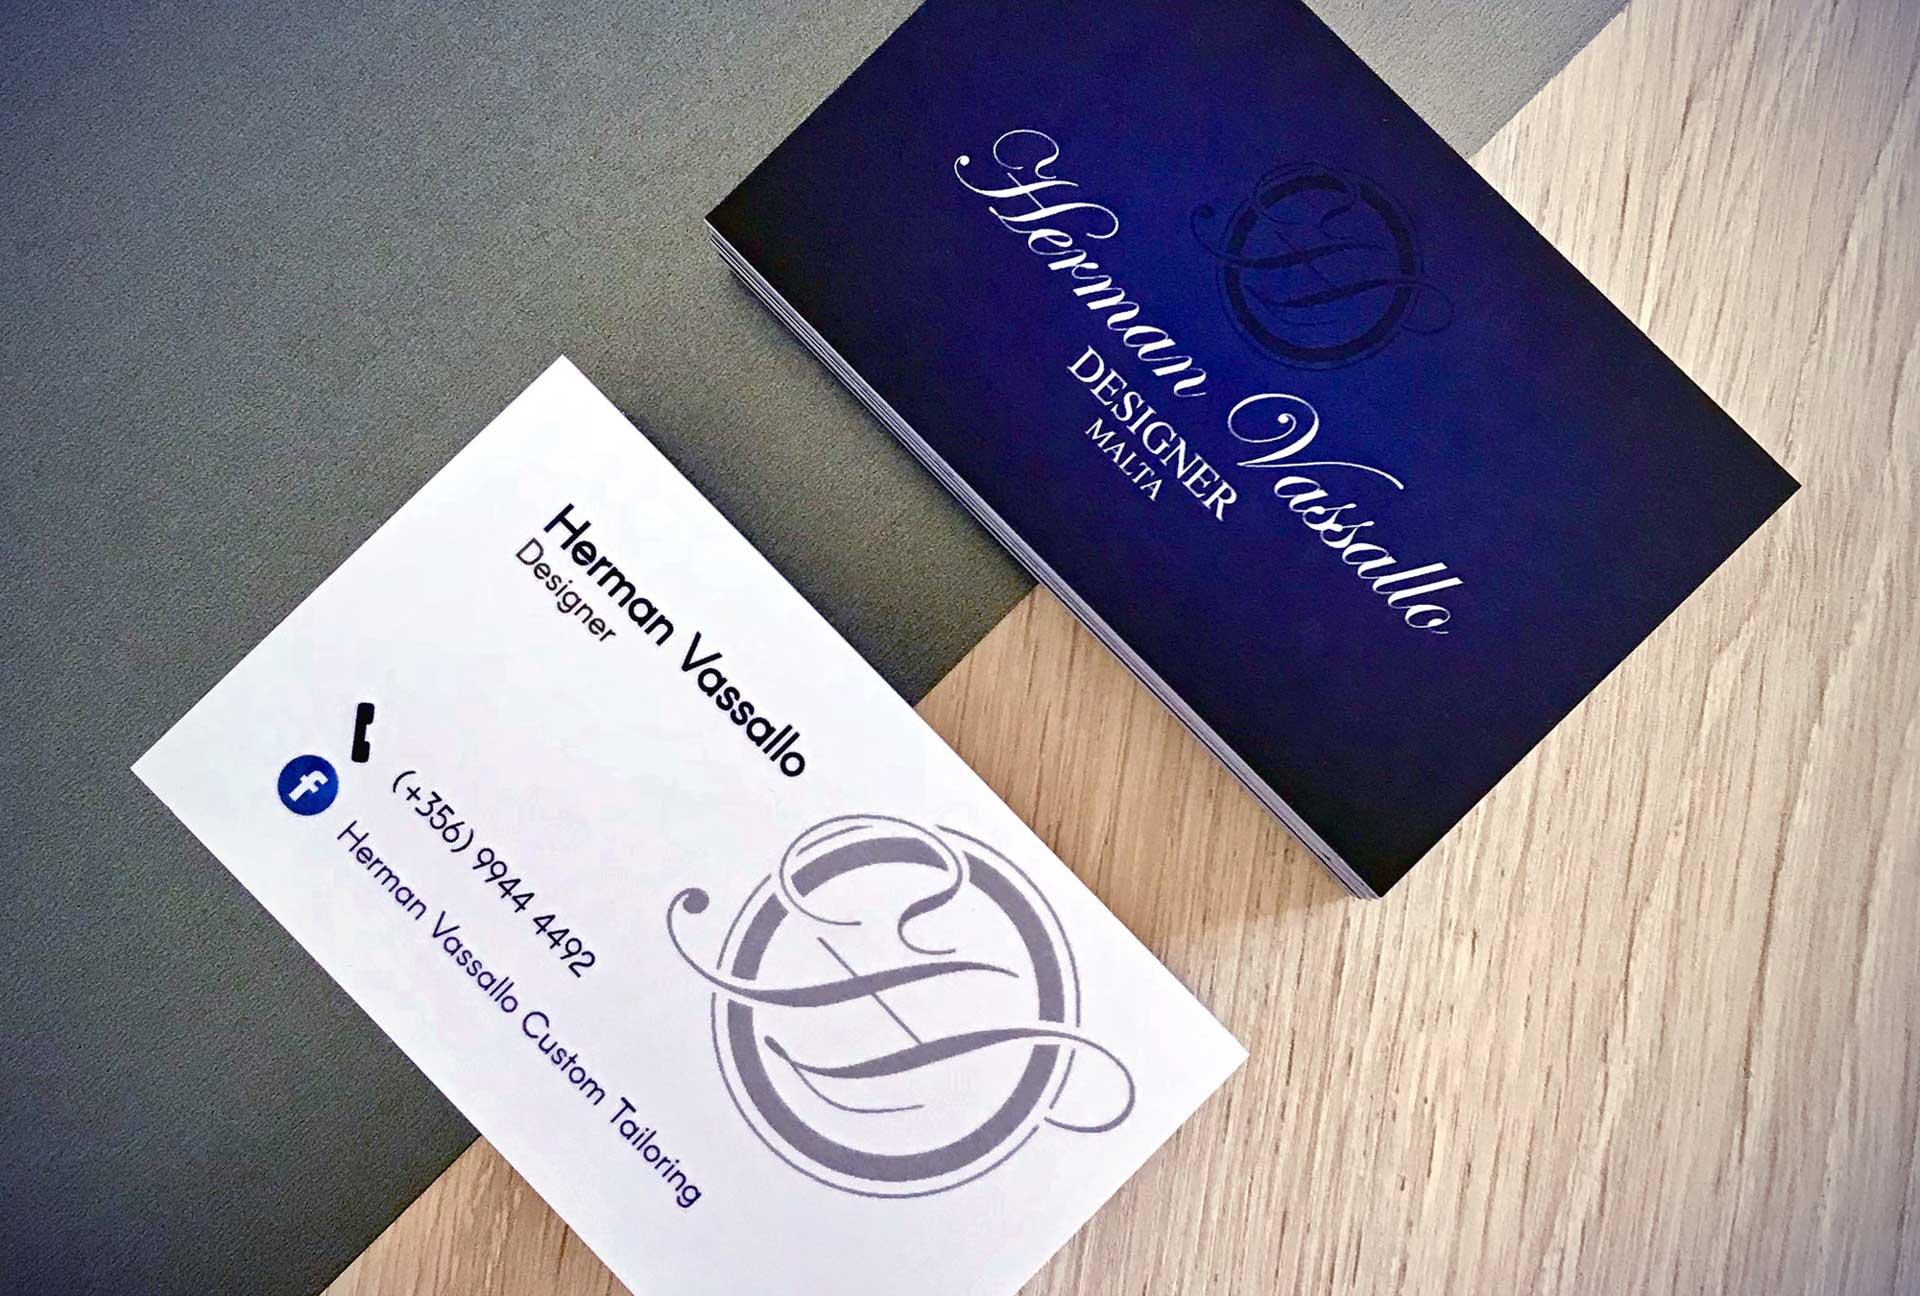 Business Cards - Herman Vassallo